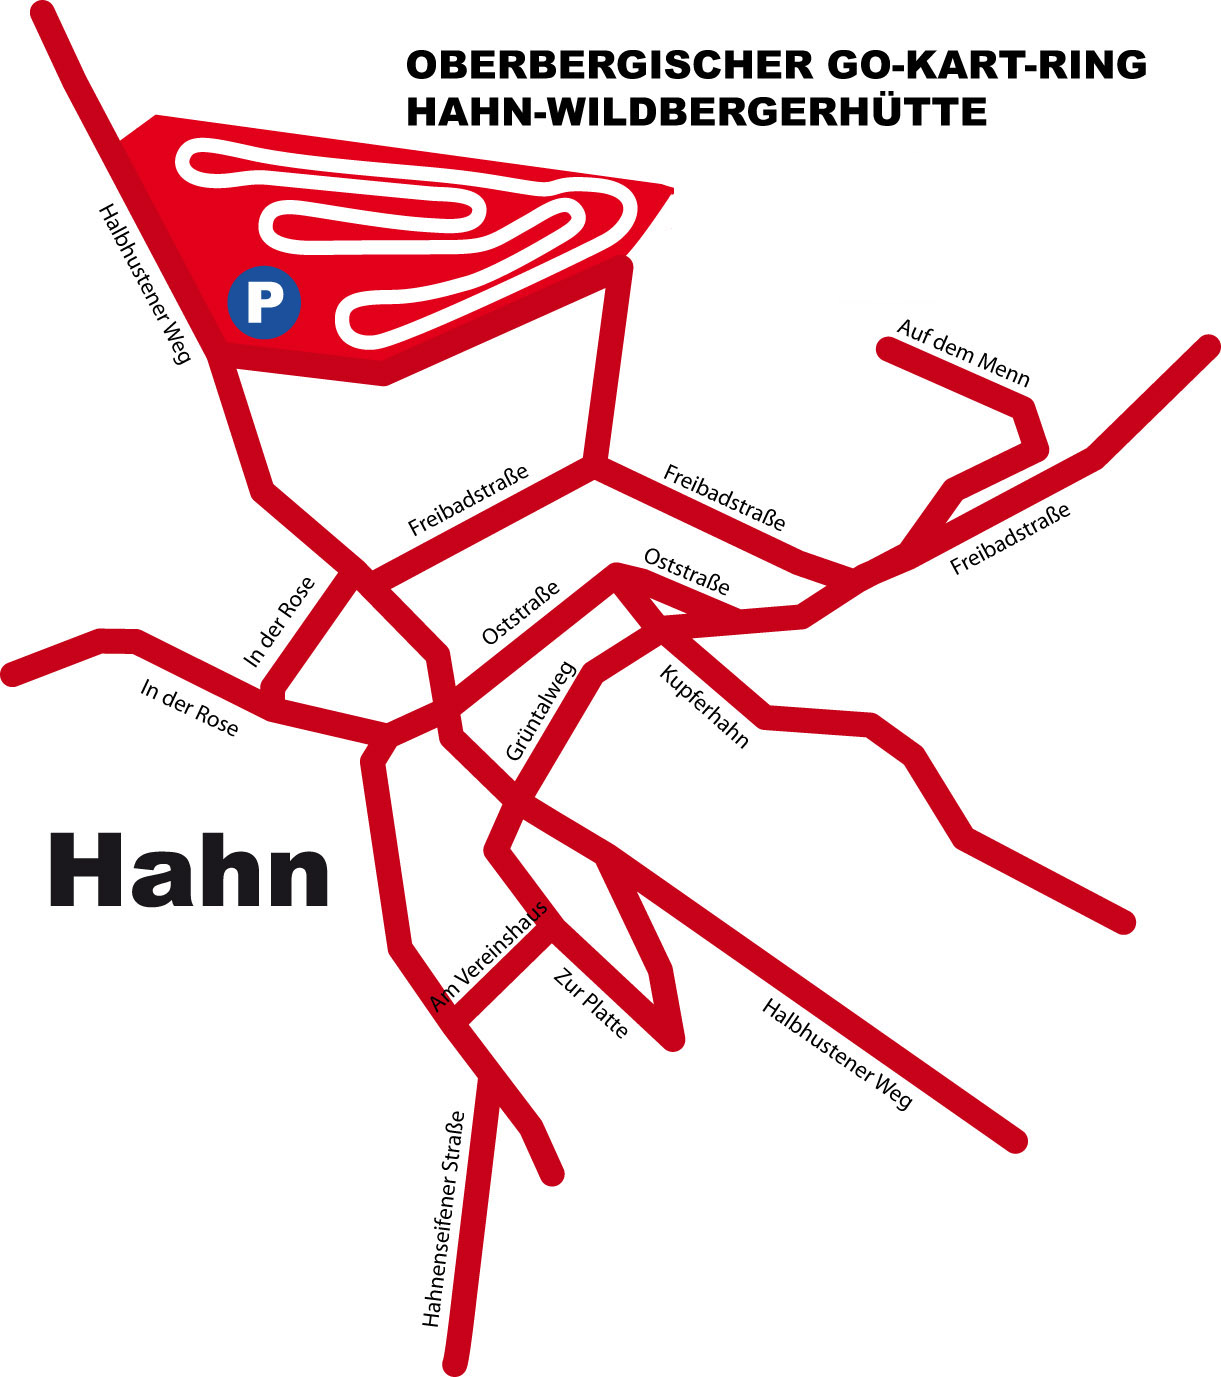 Hahnkarte_Detail_kl